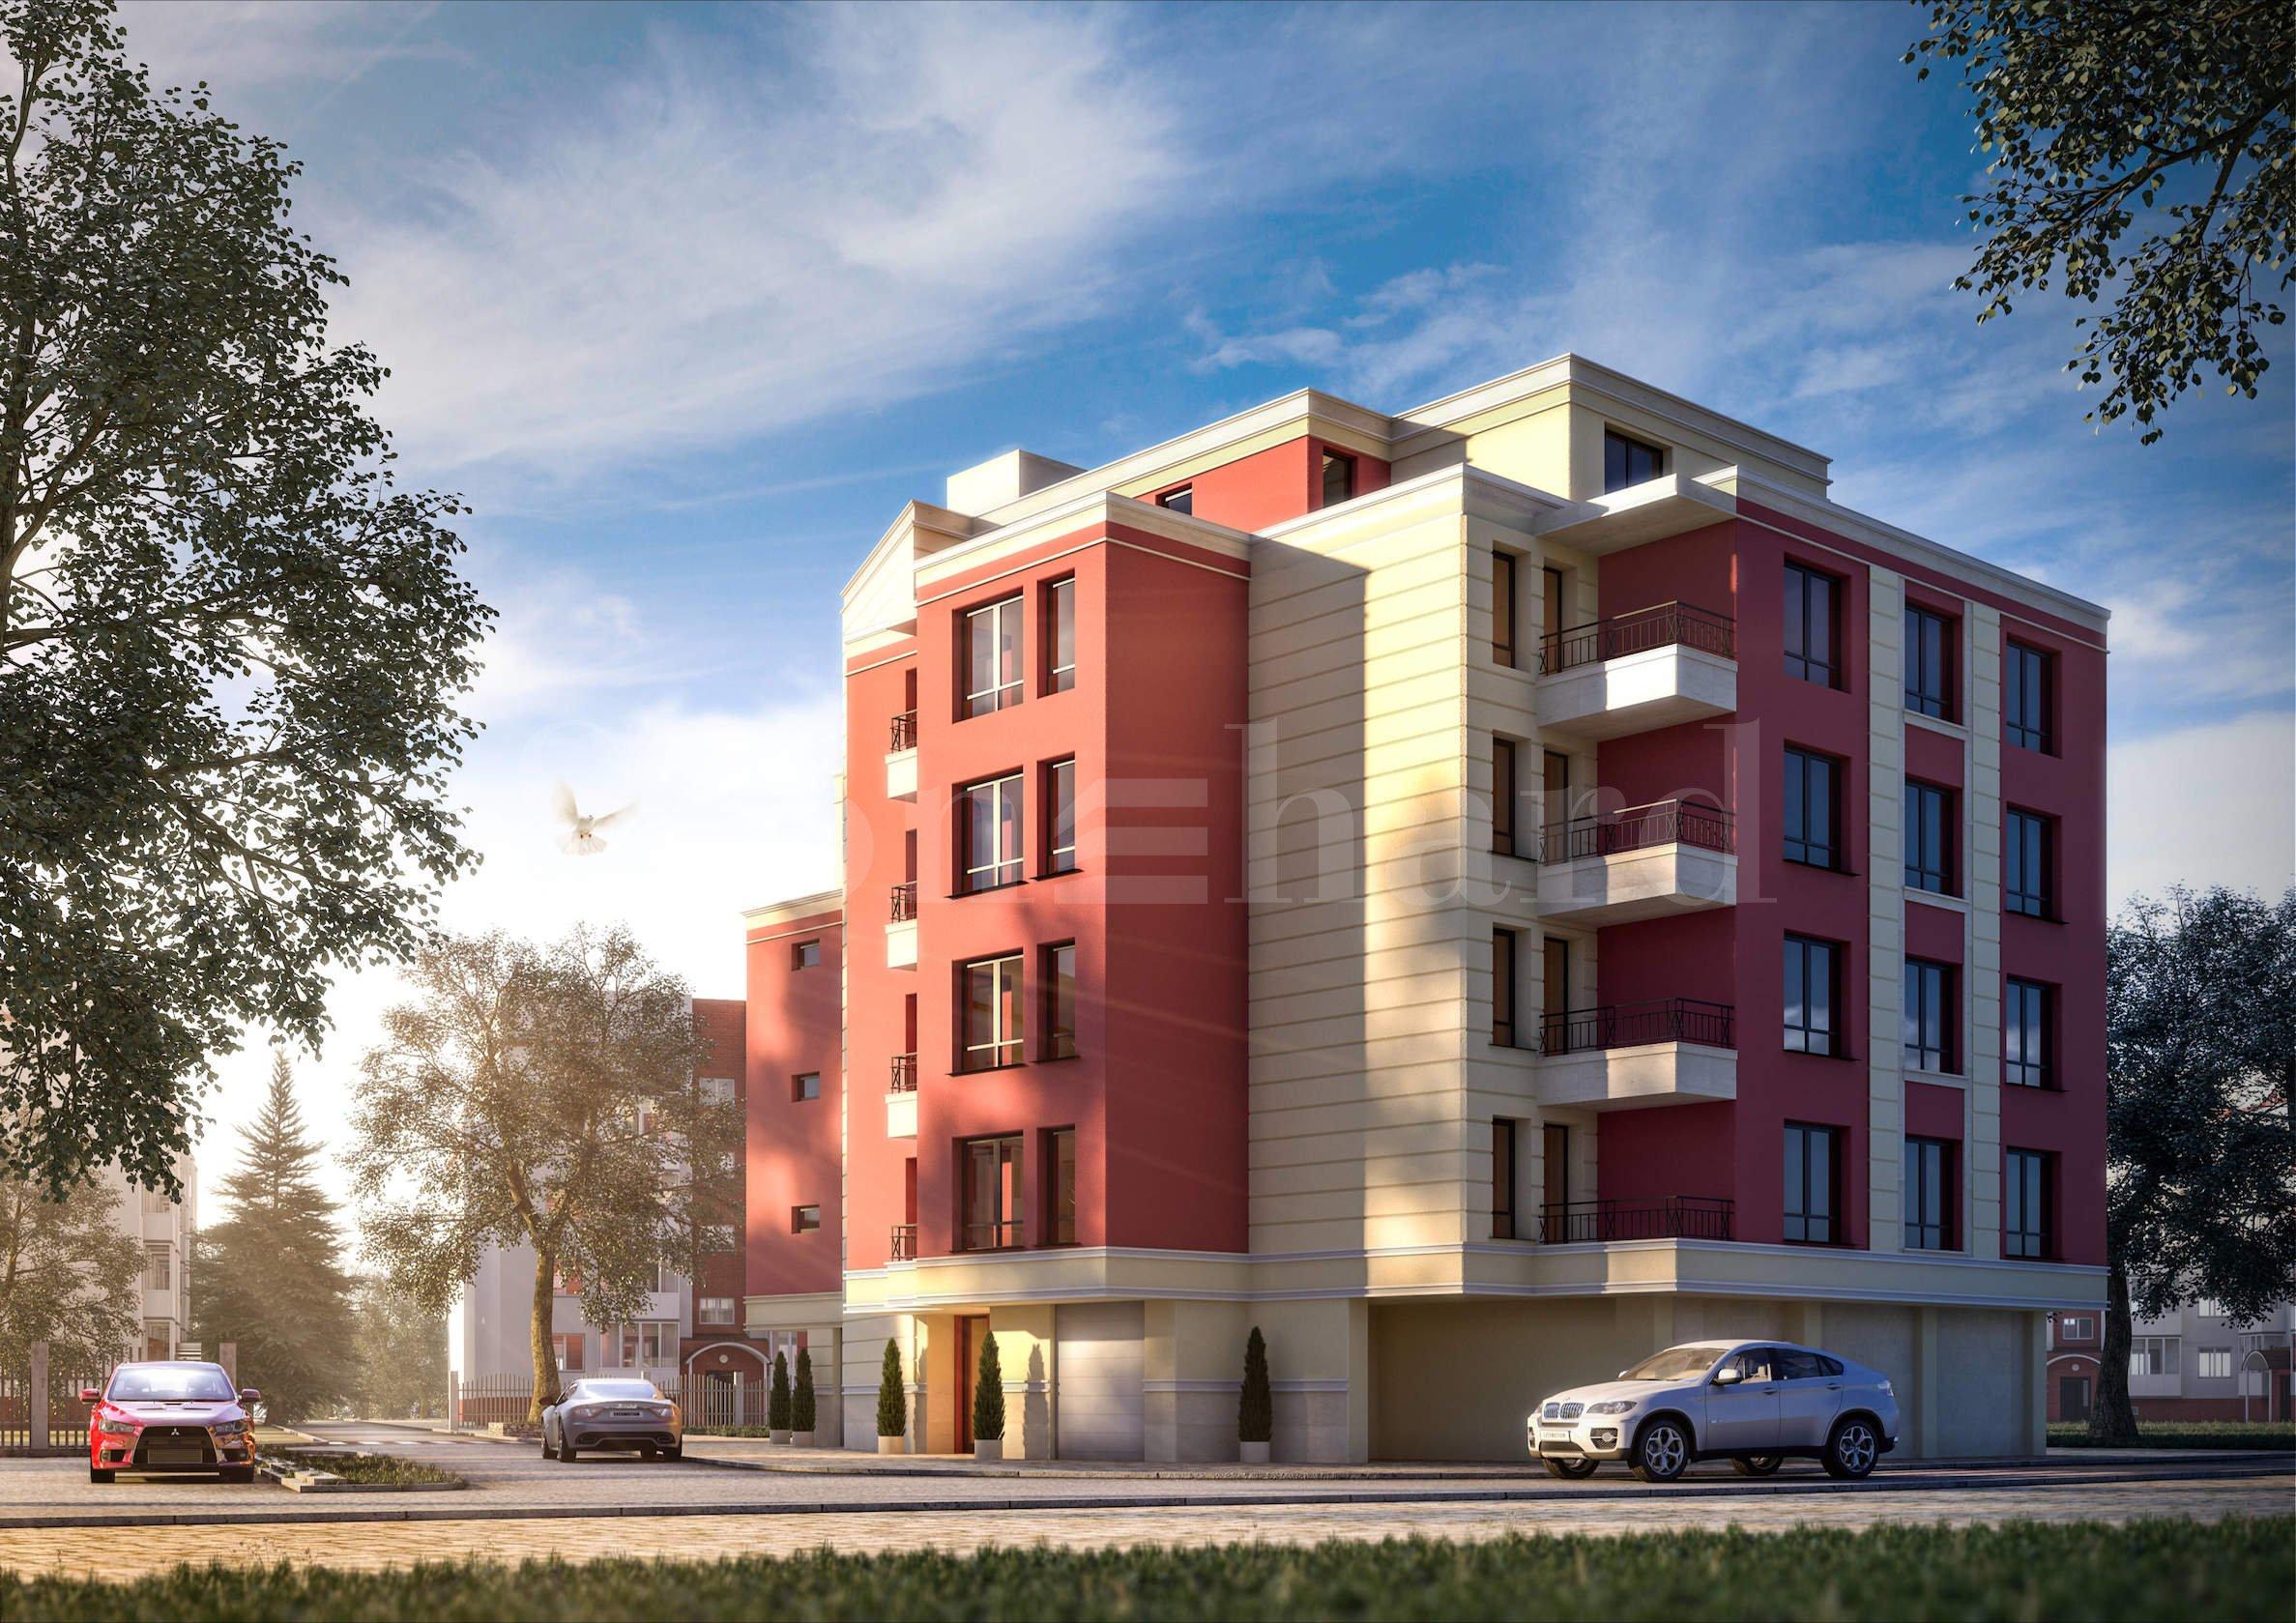 Многофамилна жилищна сграда с гаражи и паркоместа1 - Stonehard